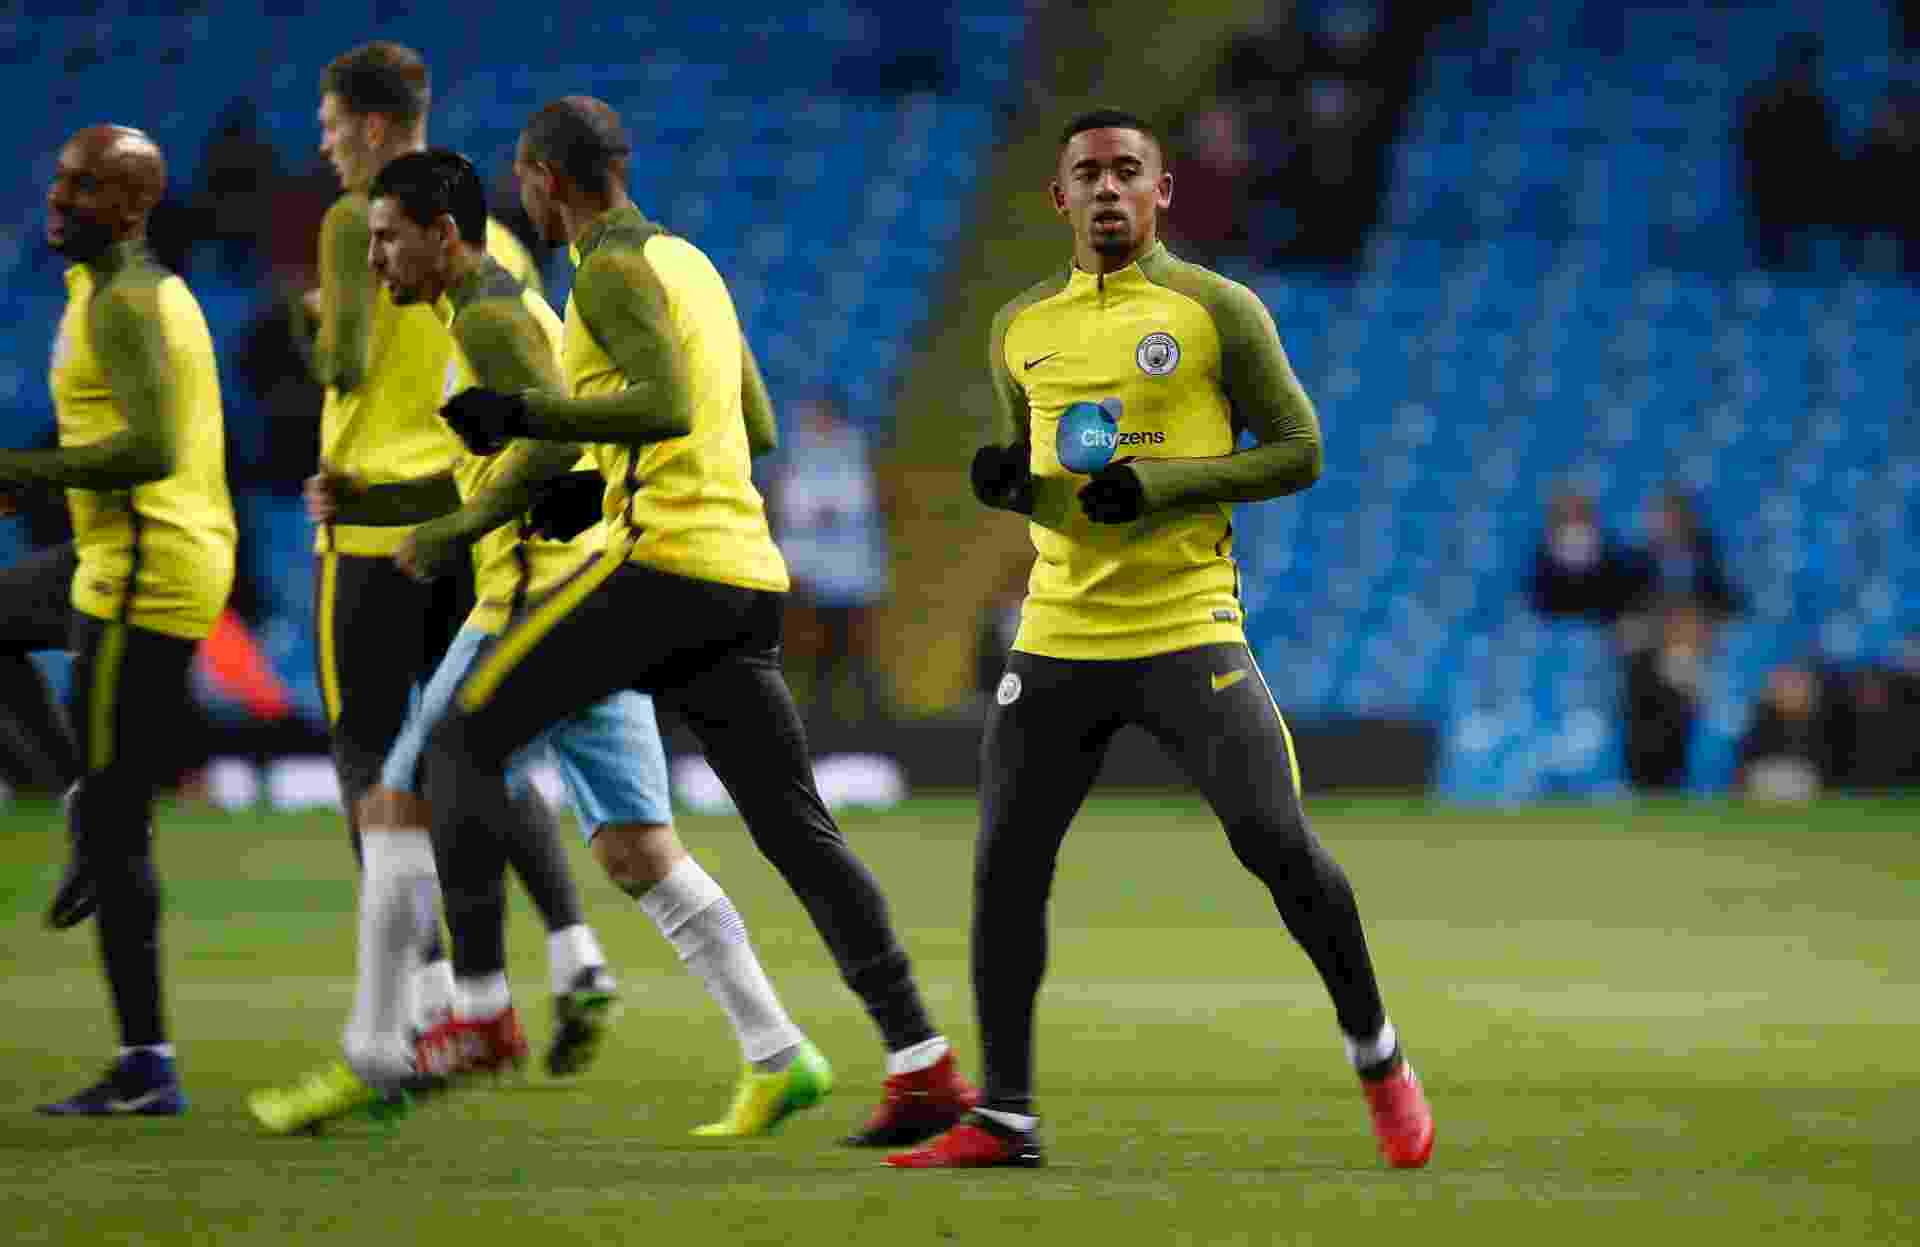 Gabriel Jesus se aquece antes da partida entre Manchester City e Tottenham, pela Premier League - Reuters / Andrew Yates